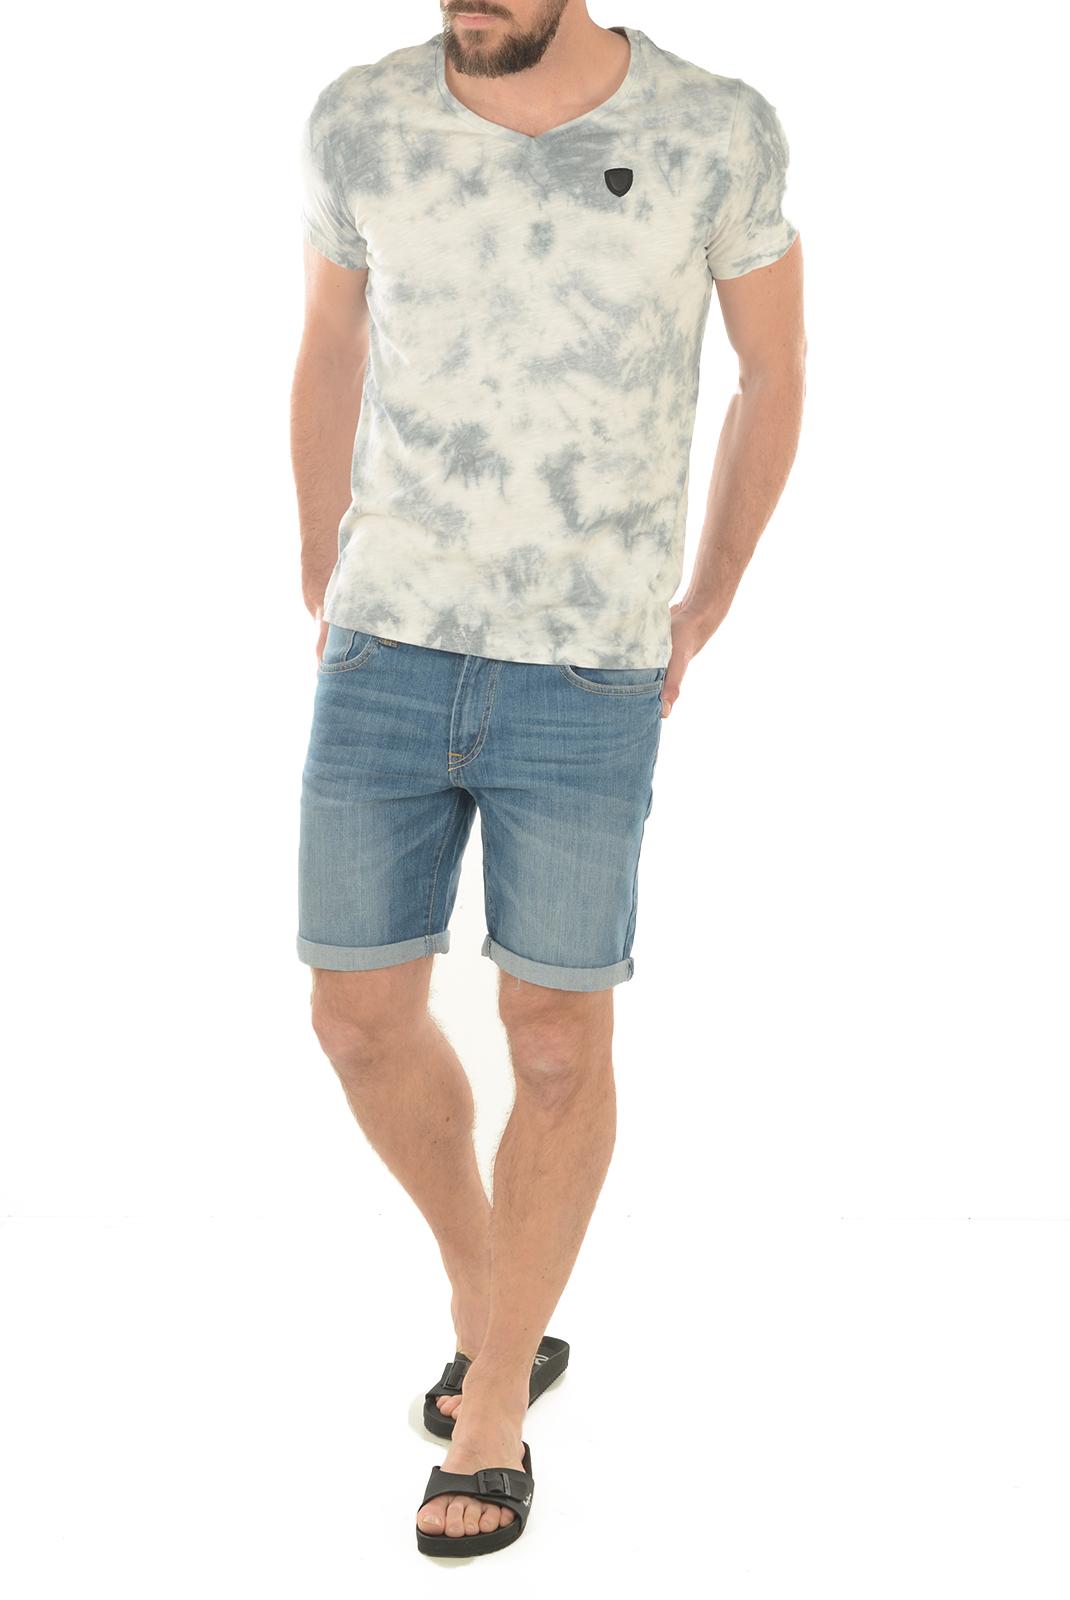 Shorts & Bermudas  Pepe jeans PM800272H63 CANE SHORT 000 DENIM